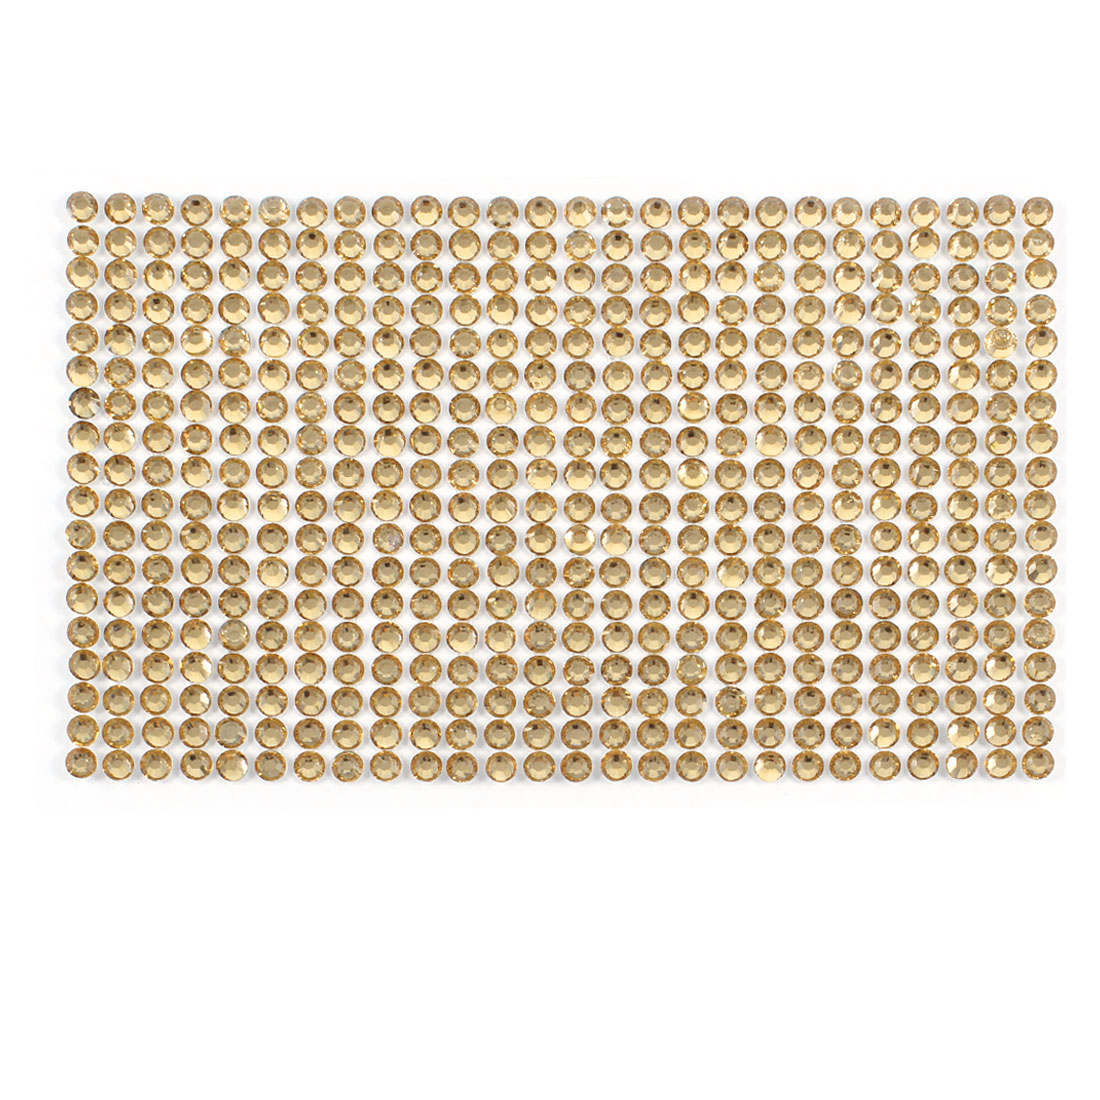 Shiny Gold Tone Rhinestone Round Shaped Cell Phone Smartphone Sticker